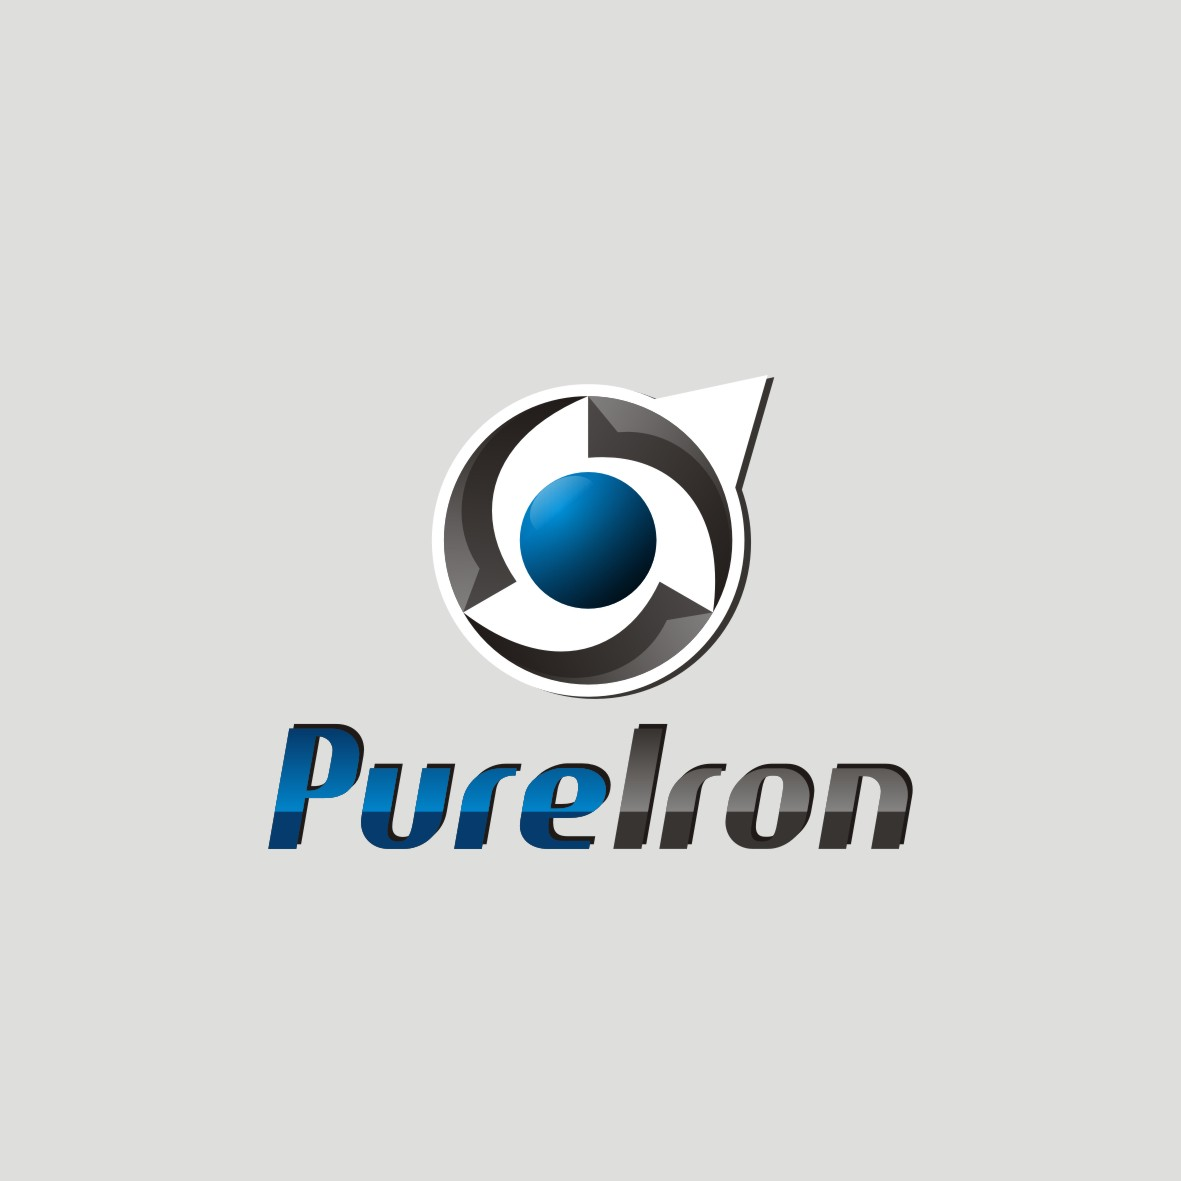 Logo Design by arteo_design - Entry No. 281 in the Logo Design Contest Fun Logo Design for Pure Iron.